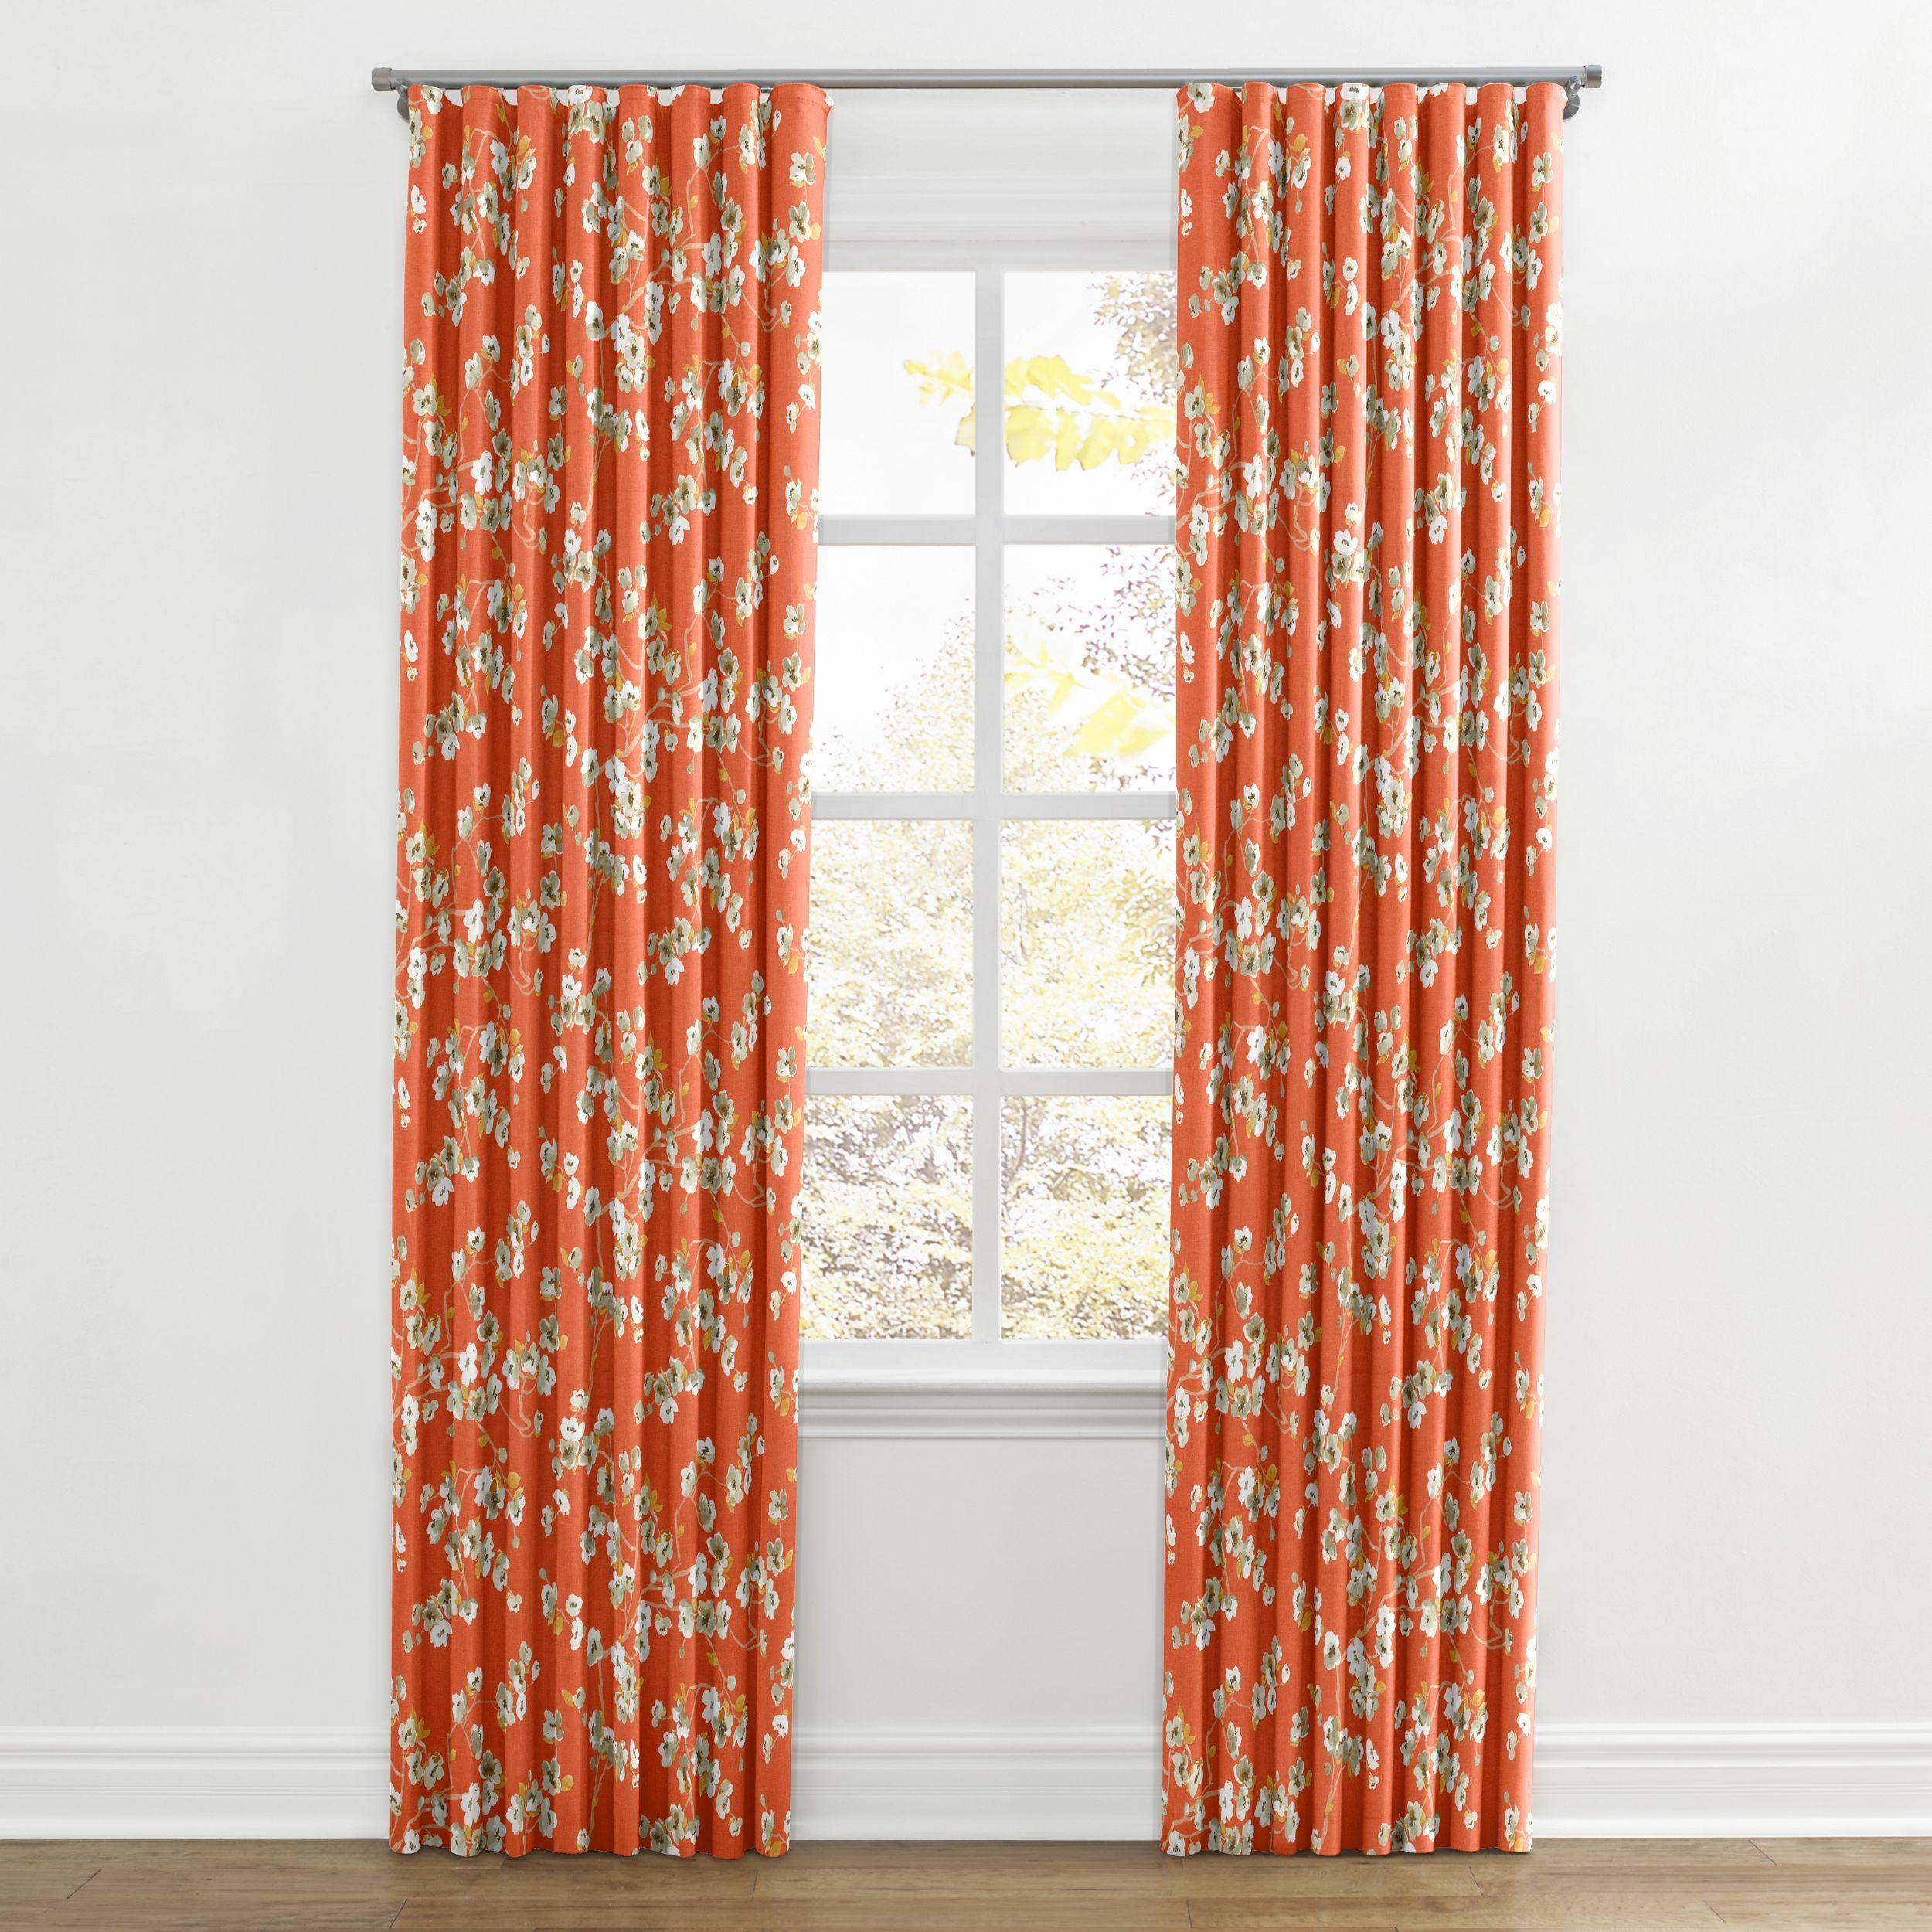 Drapery, Curtains, Coral Orange